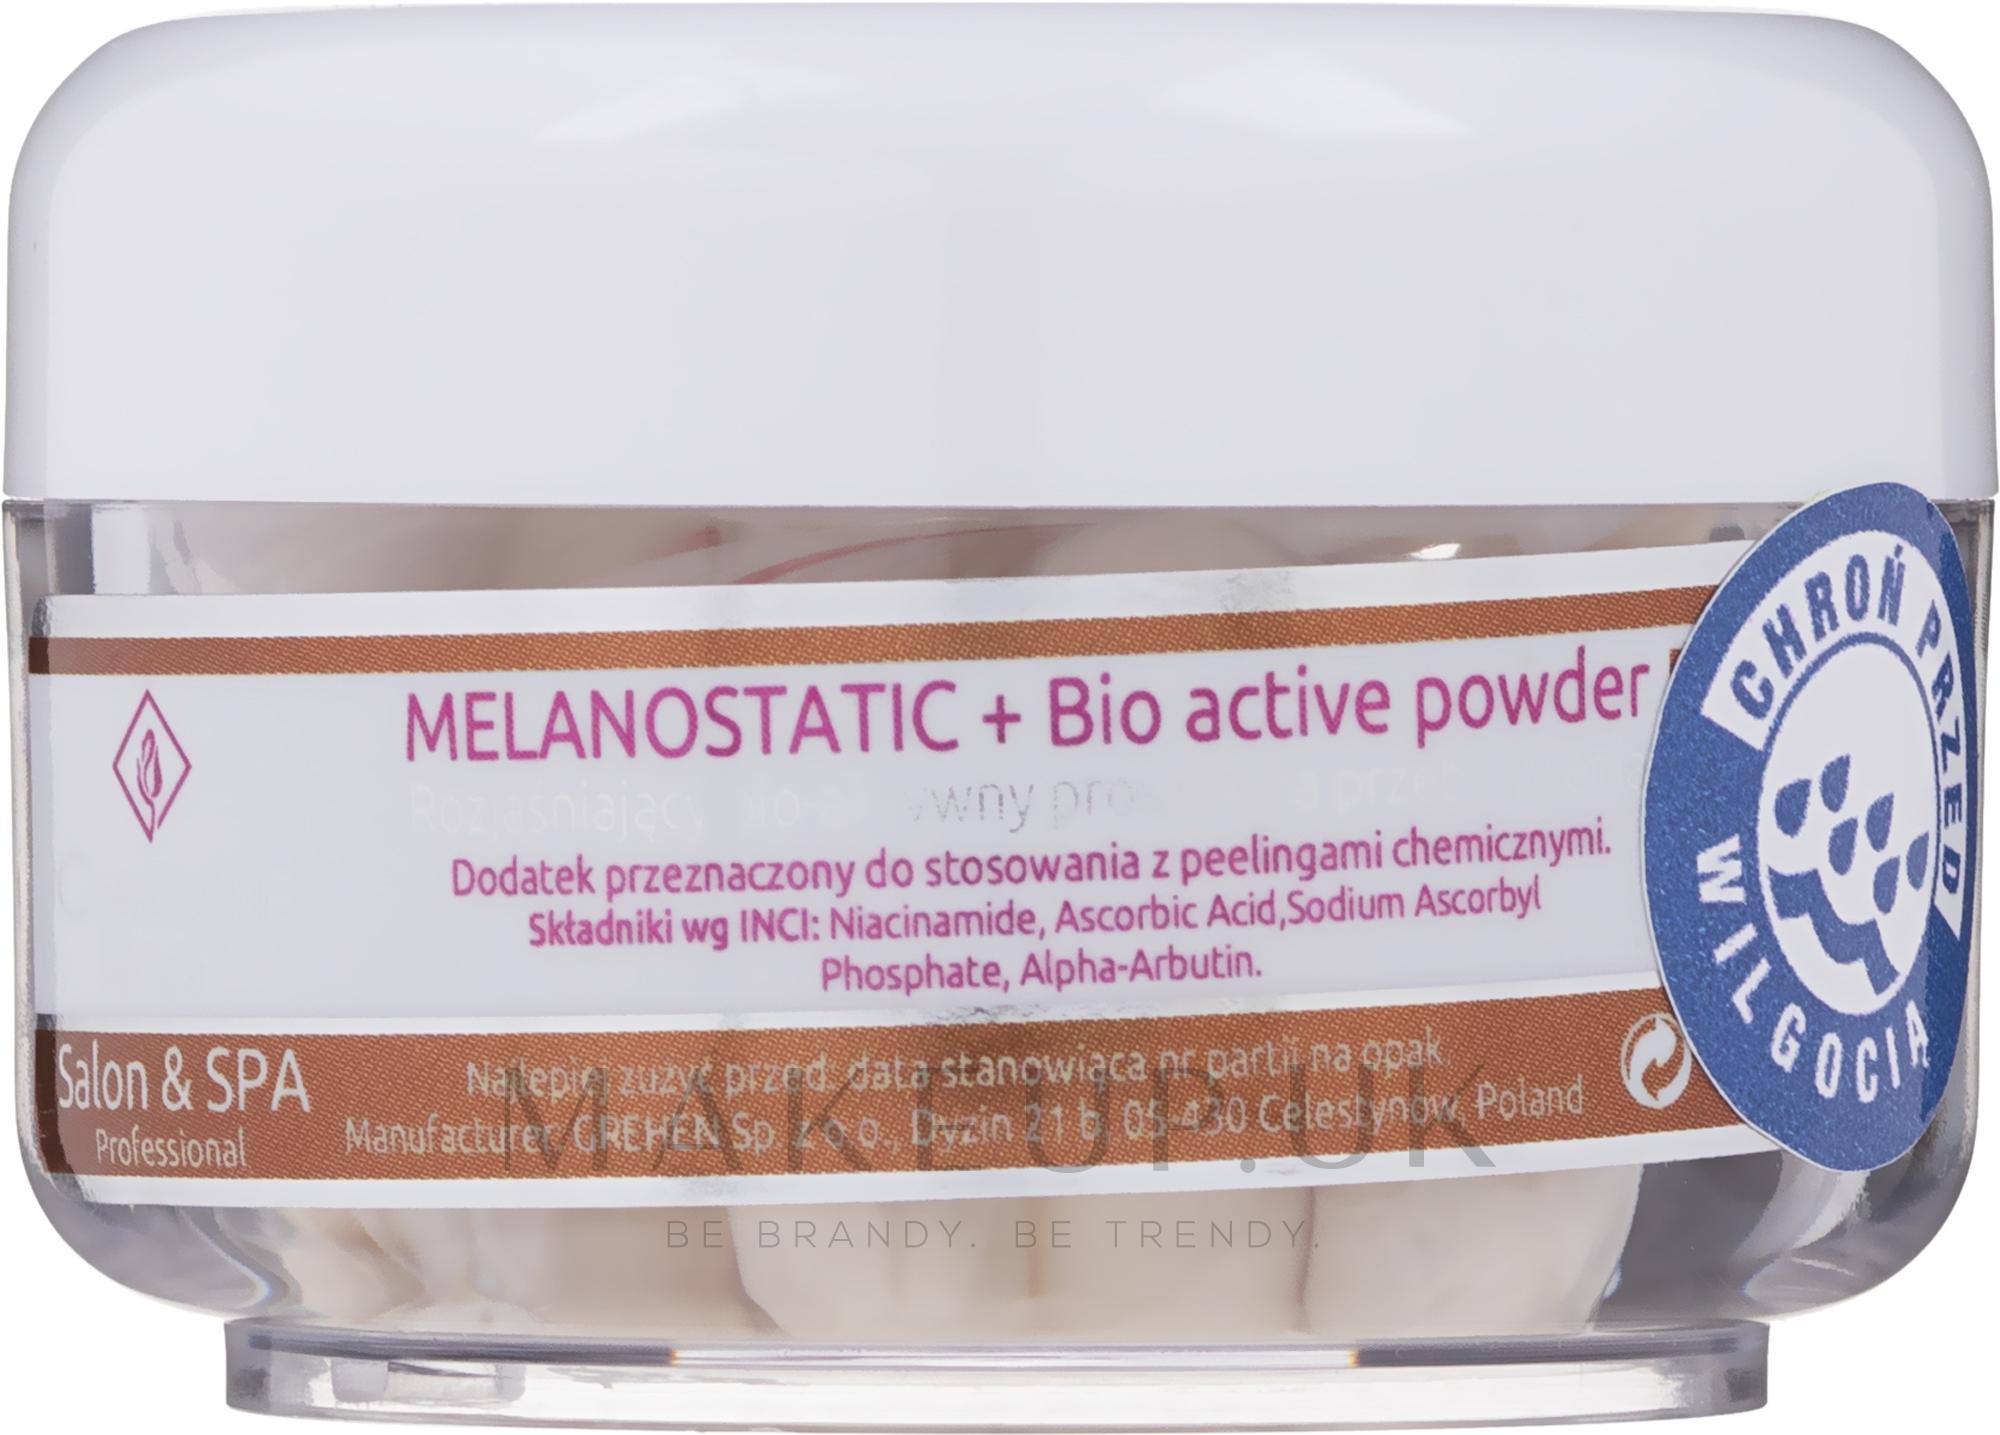 Bio Active Face Powder - Charmine Rose Melanostatic + Bio Active Powder — photo 20 x 0.25 g